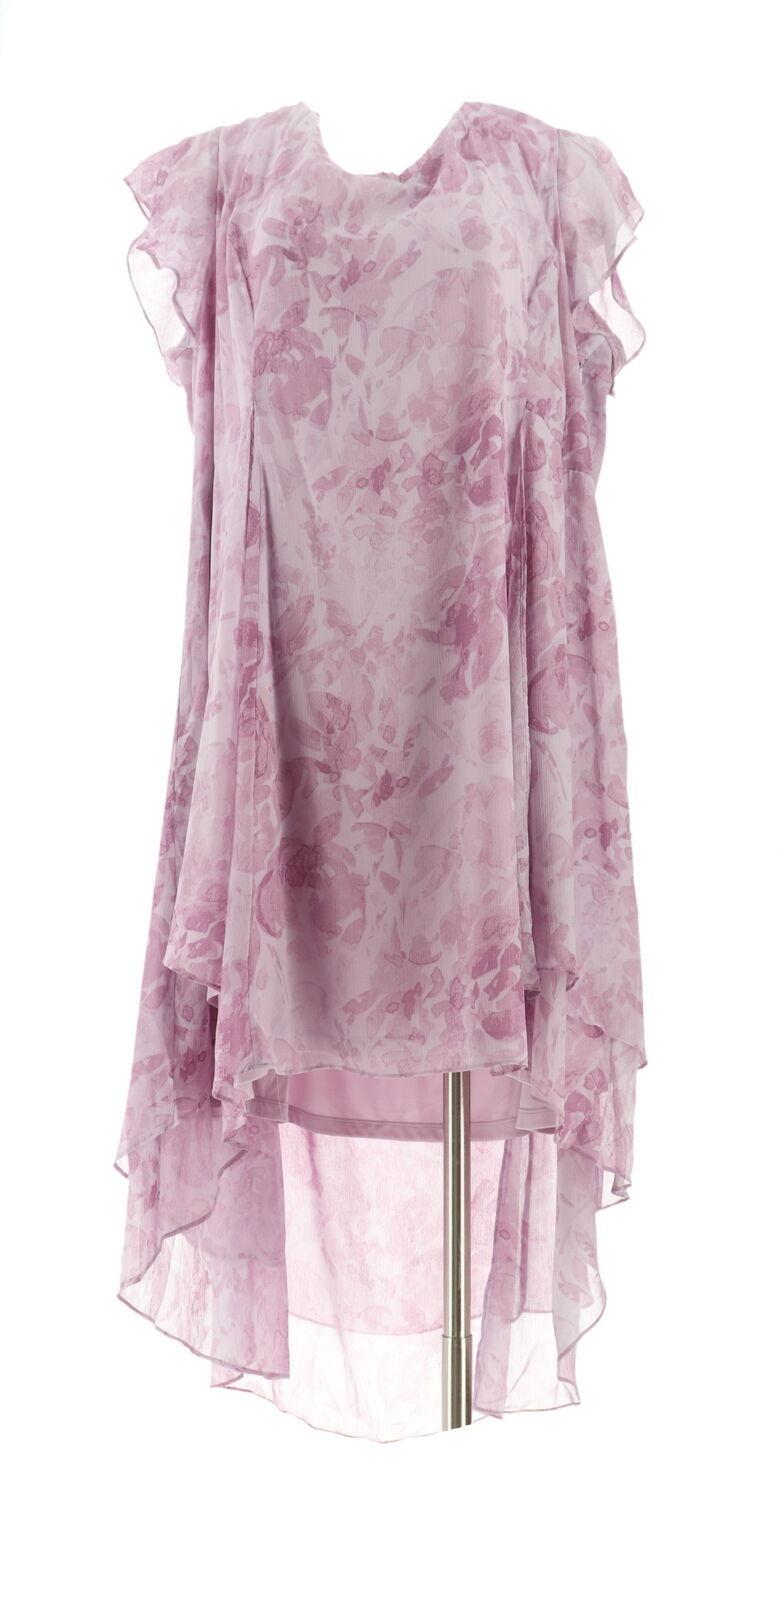 H Halston Petite Rose Print Cap Slv Hi-Low Dress French Lilac 24P NEW A303199